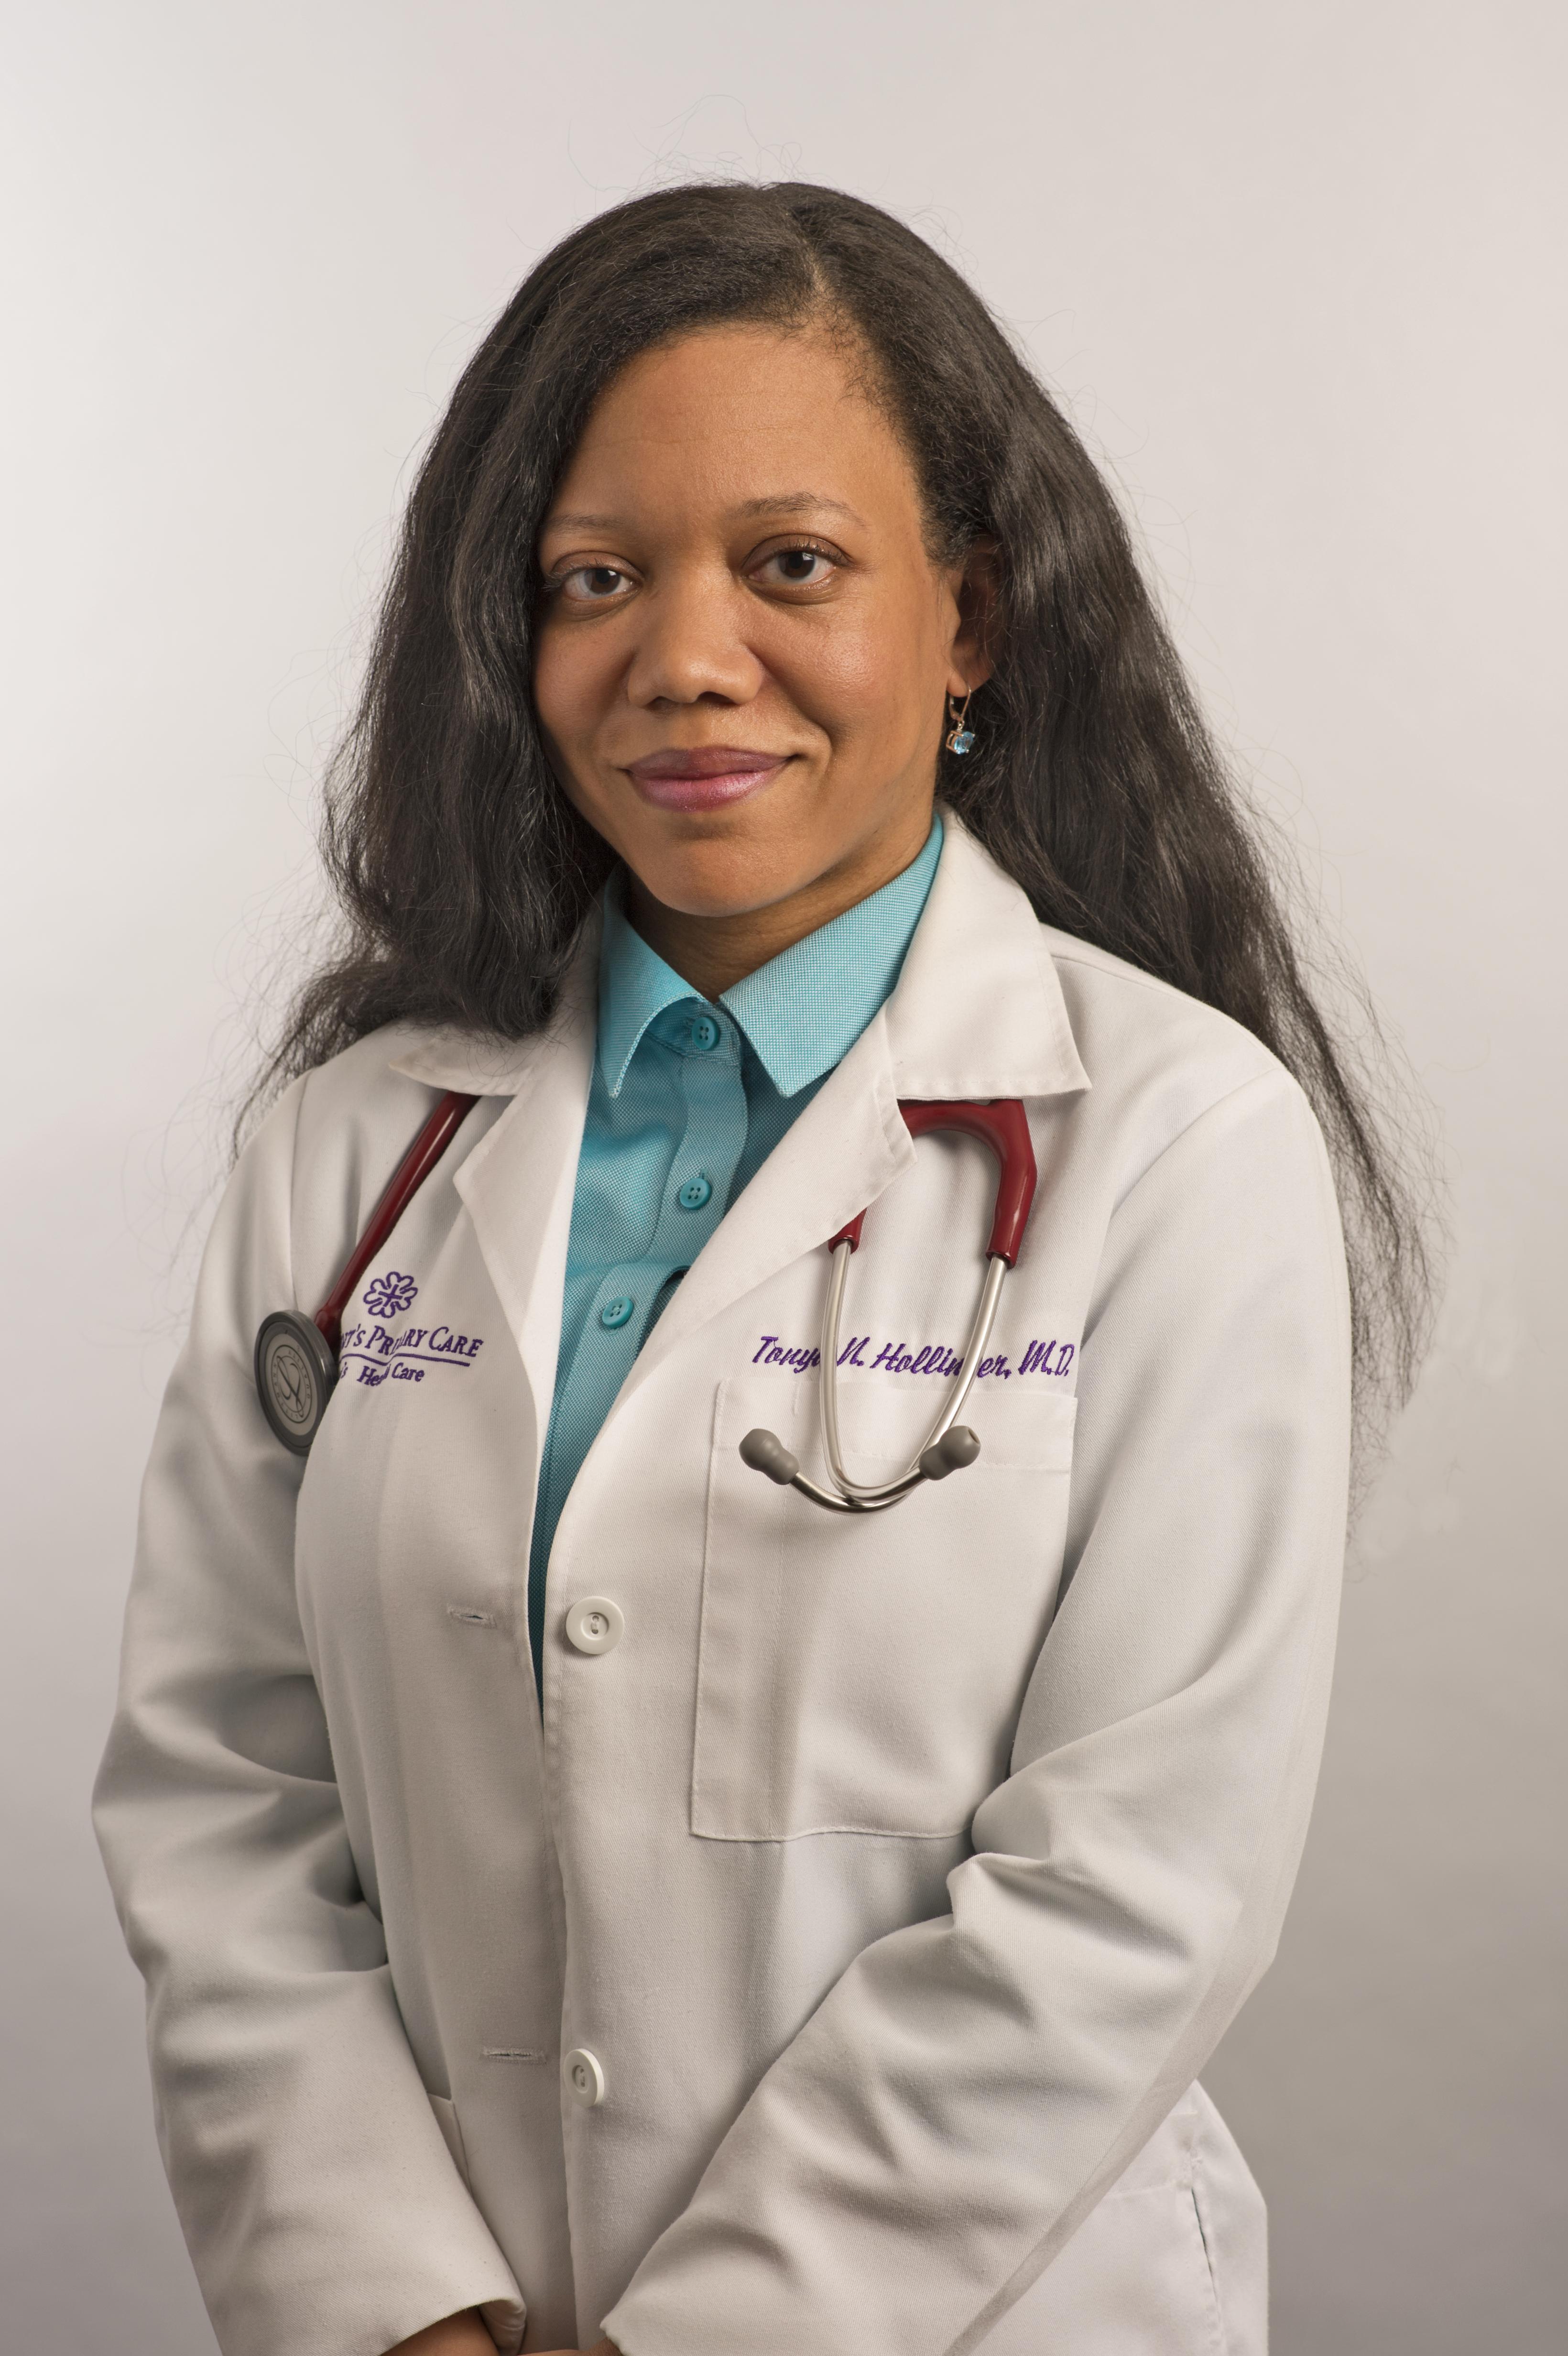 Tonya Hollinger, MD